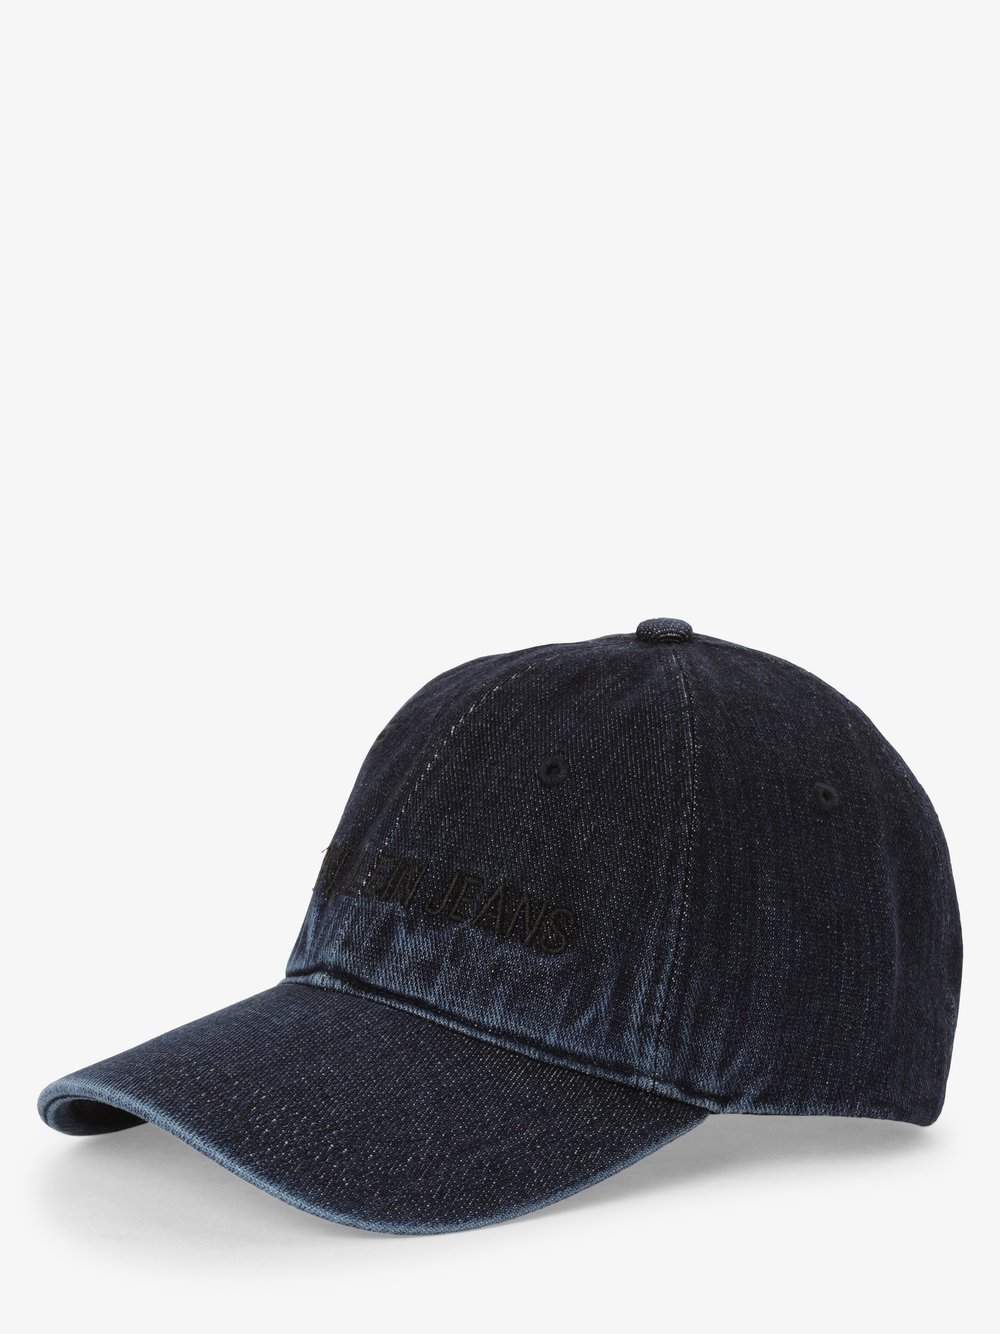 Guess Jeans Damen Cap online kaufen | PEEK UND CLOPPENBURG.DE